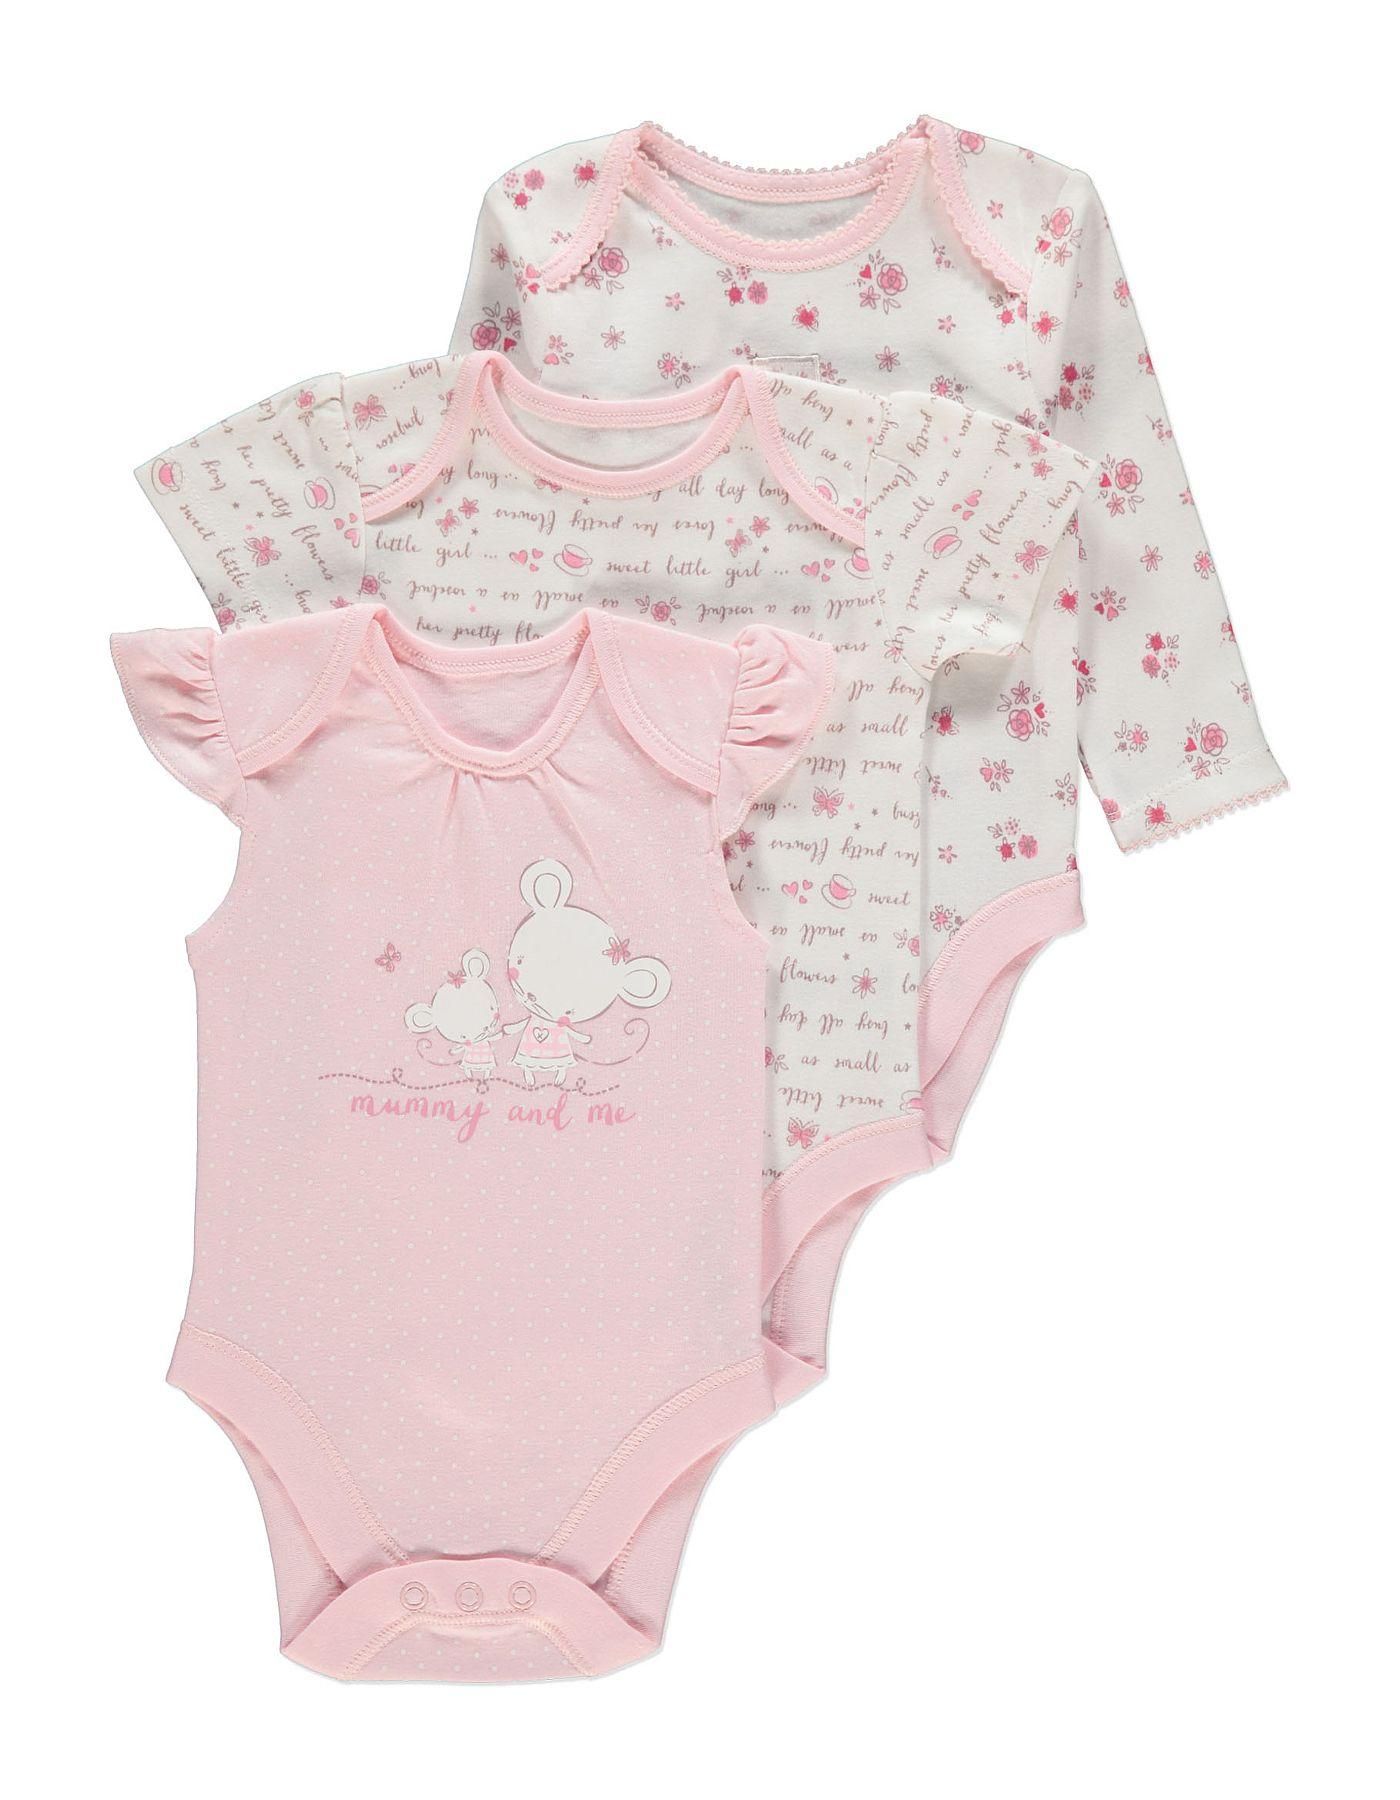 3 Pack Bodysuits Baby George At Asda Io Pinterest Babies